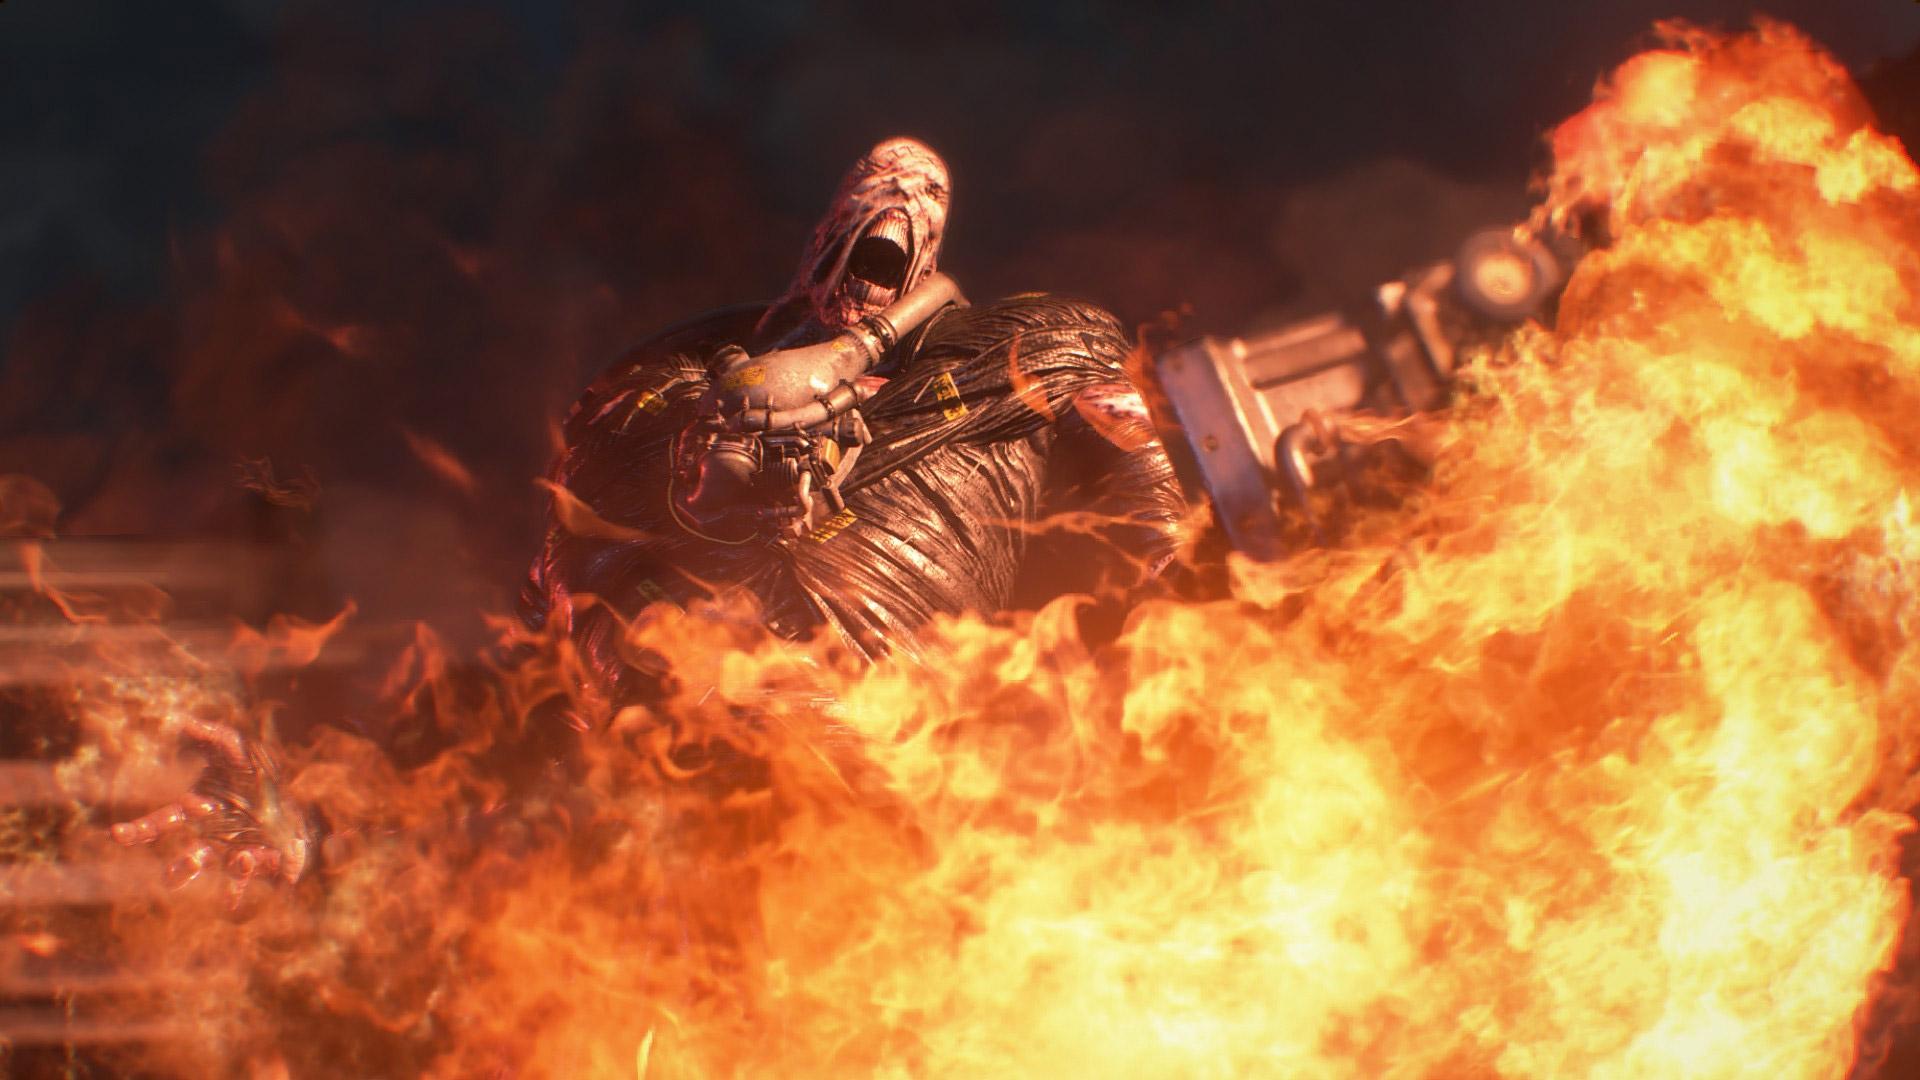 You can hear Nemesis speak in the Resident Evil 2 demo screenshot